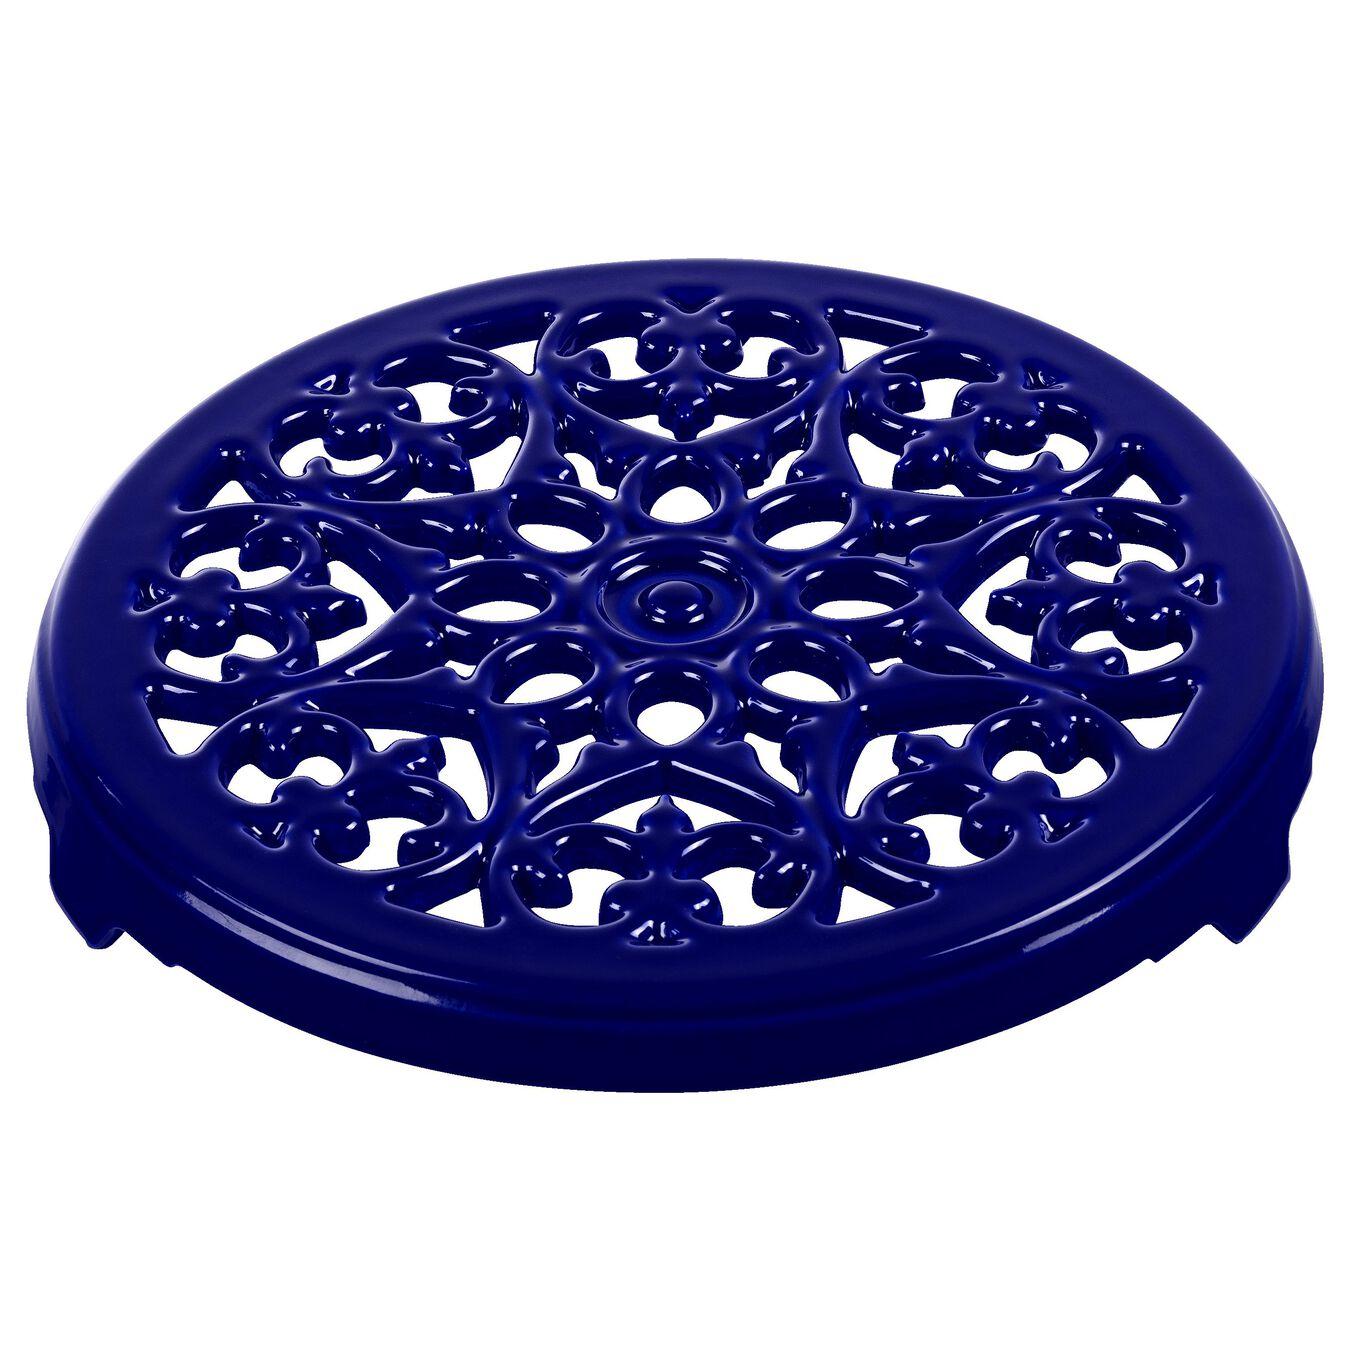 9-inch Round Lilly Trivet - Dark Blue,,large 1